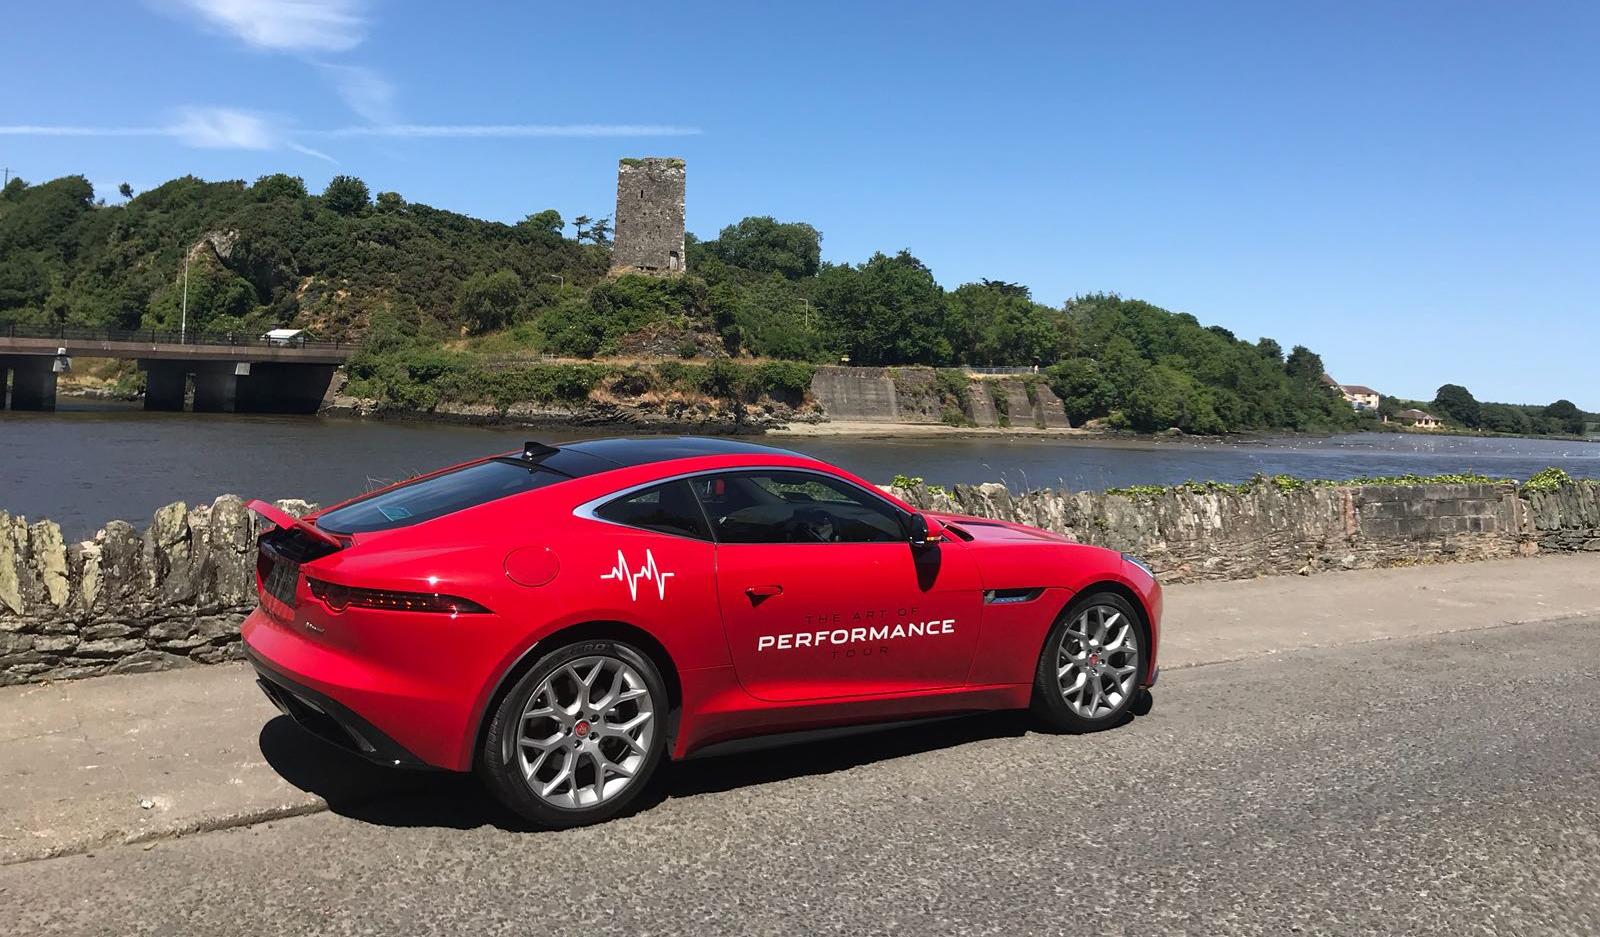 Orangeworks Teams with Jaguar Ireland for the Art of Performance Tour 2018